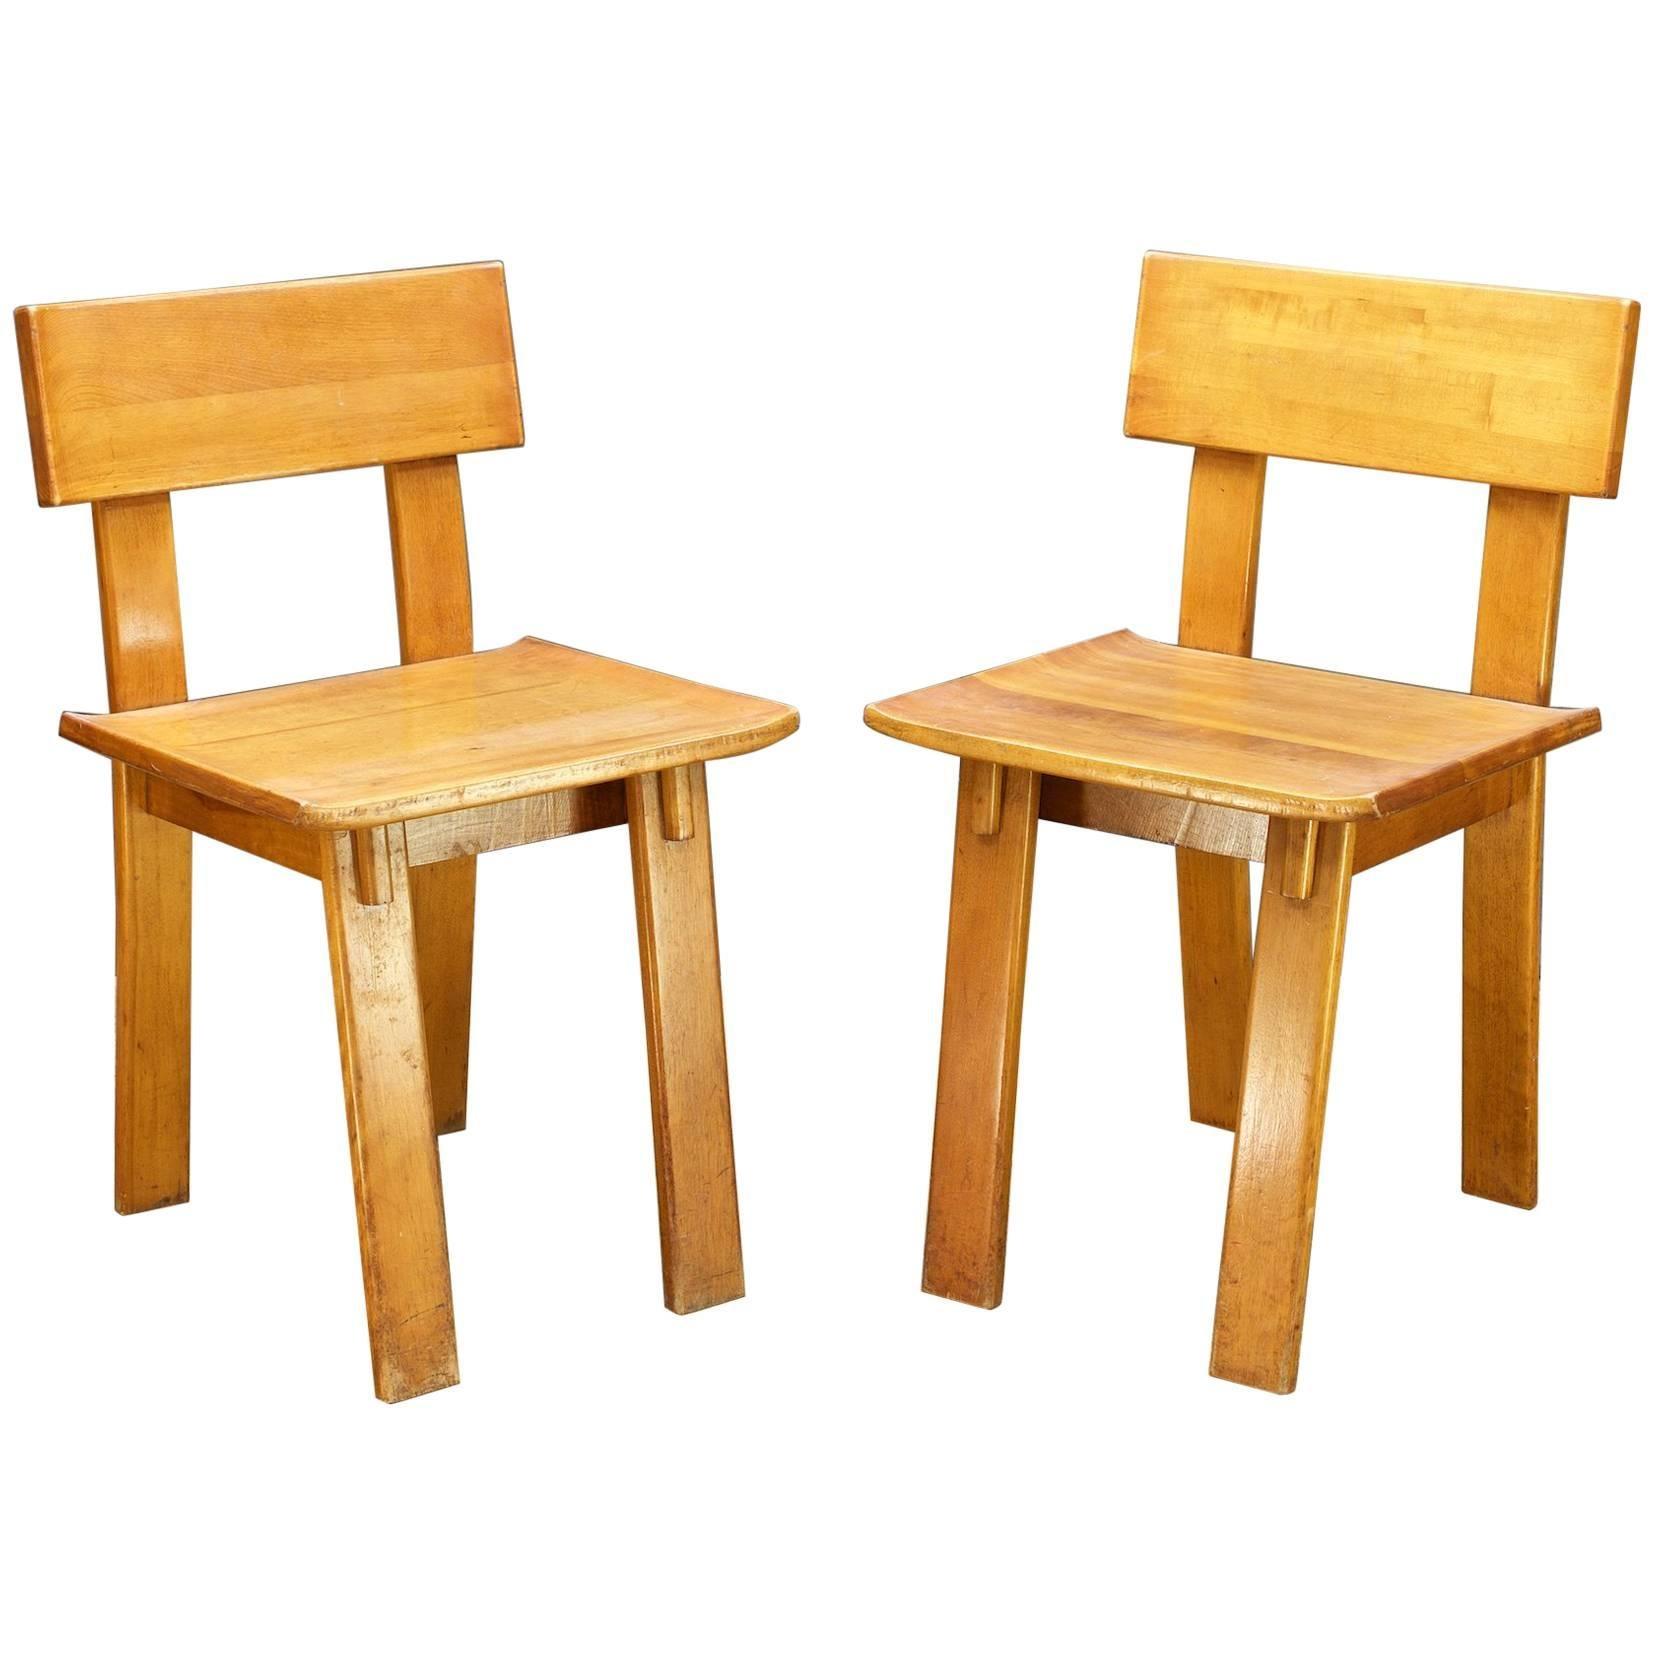 Superb 1935 Rare Russel Wright American Modern Furniture Design Conant Ball Chairs